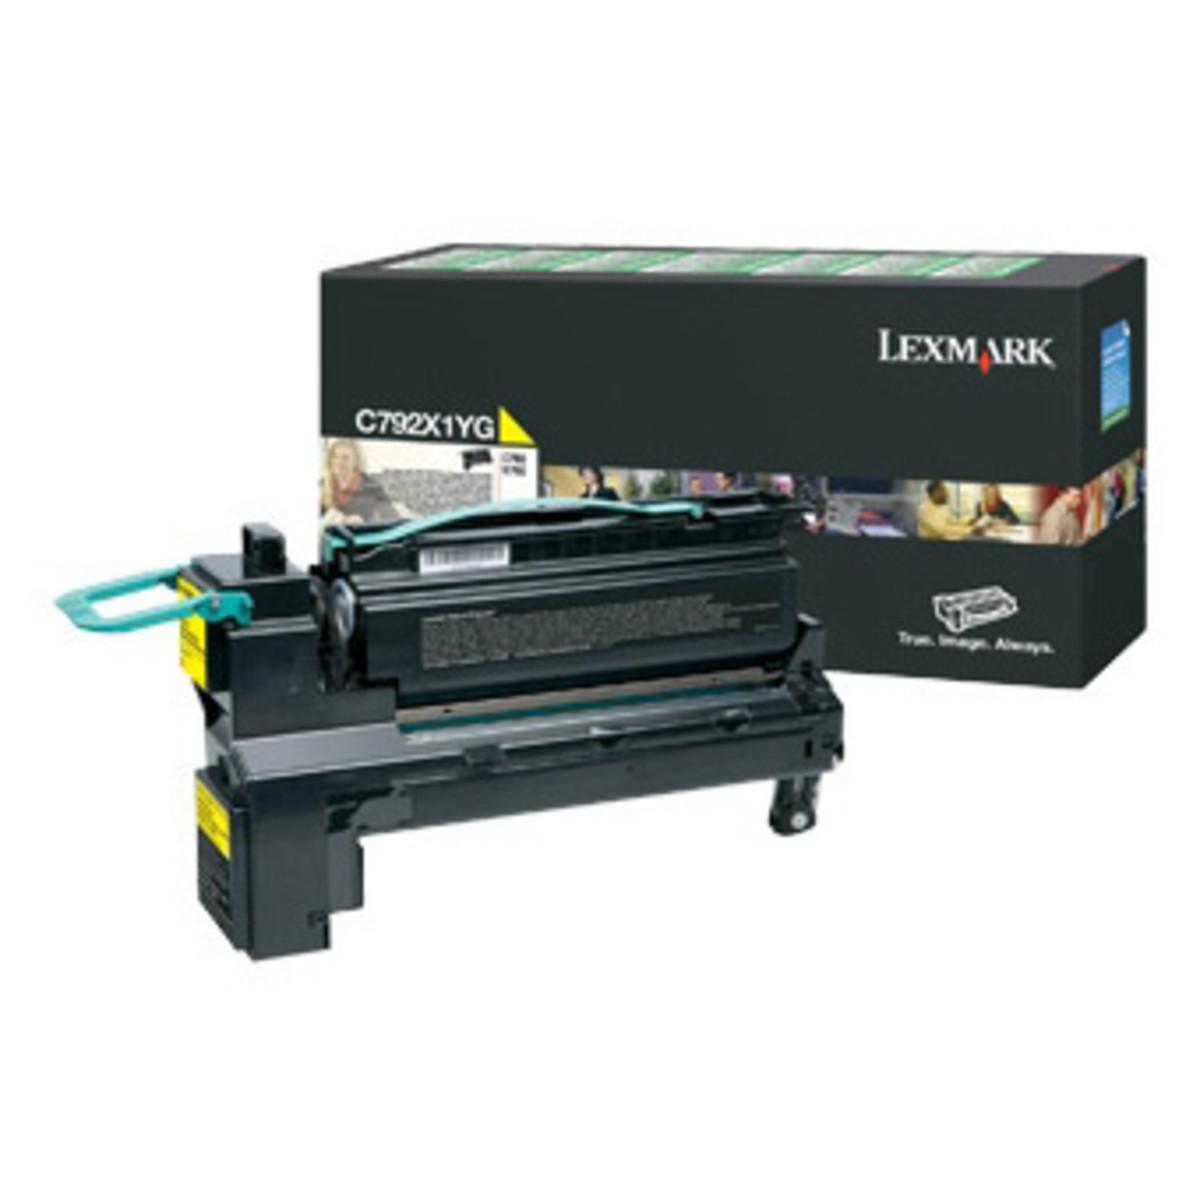 Lexmark C792X1YG Yellow Toner Cartridge - High Yield